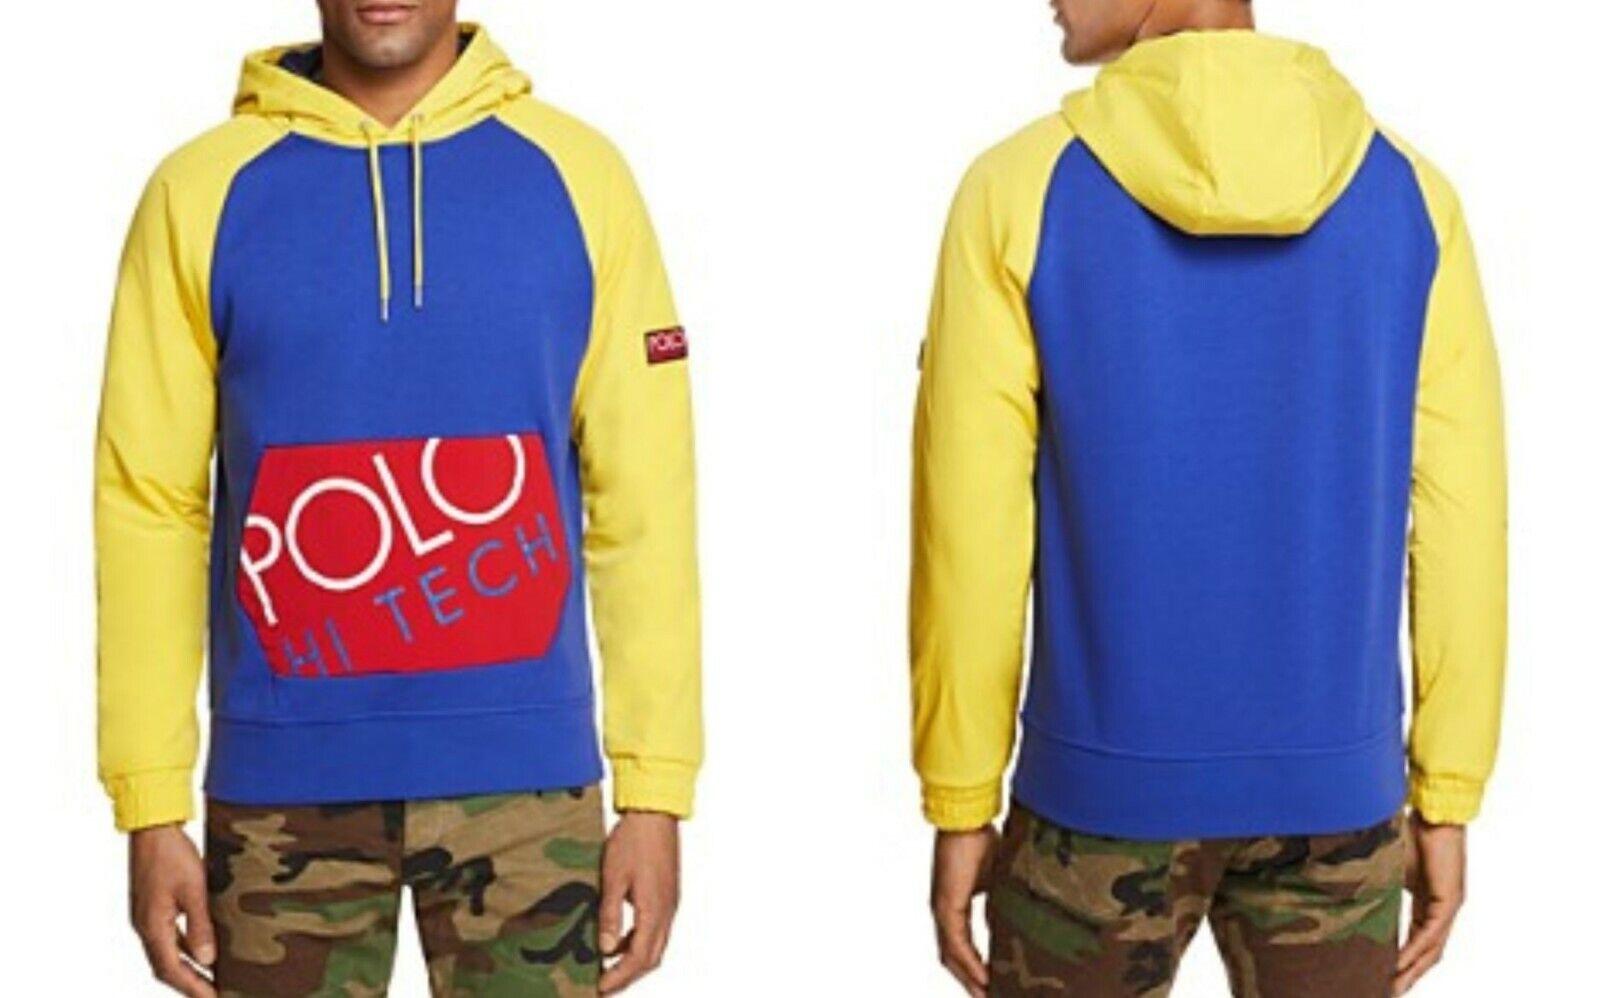 timeless design 72aee 72d02 Polo Ralph Lauren Tech Sweatshirt Vintage CP93 Stadium92 ...